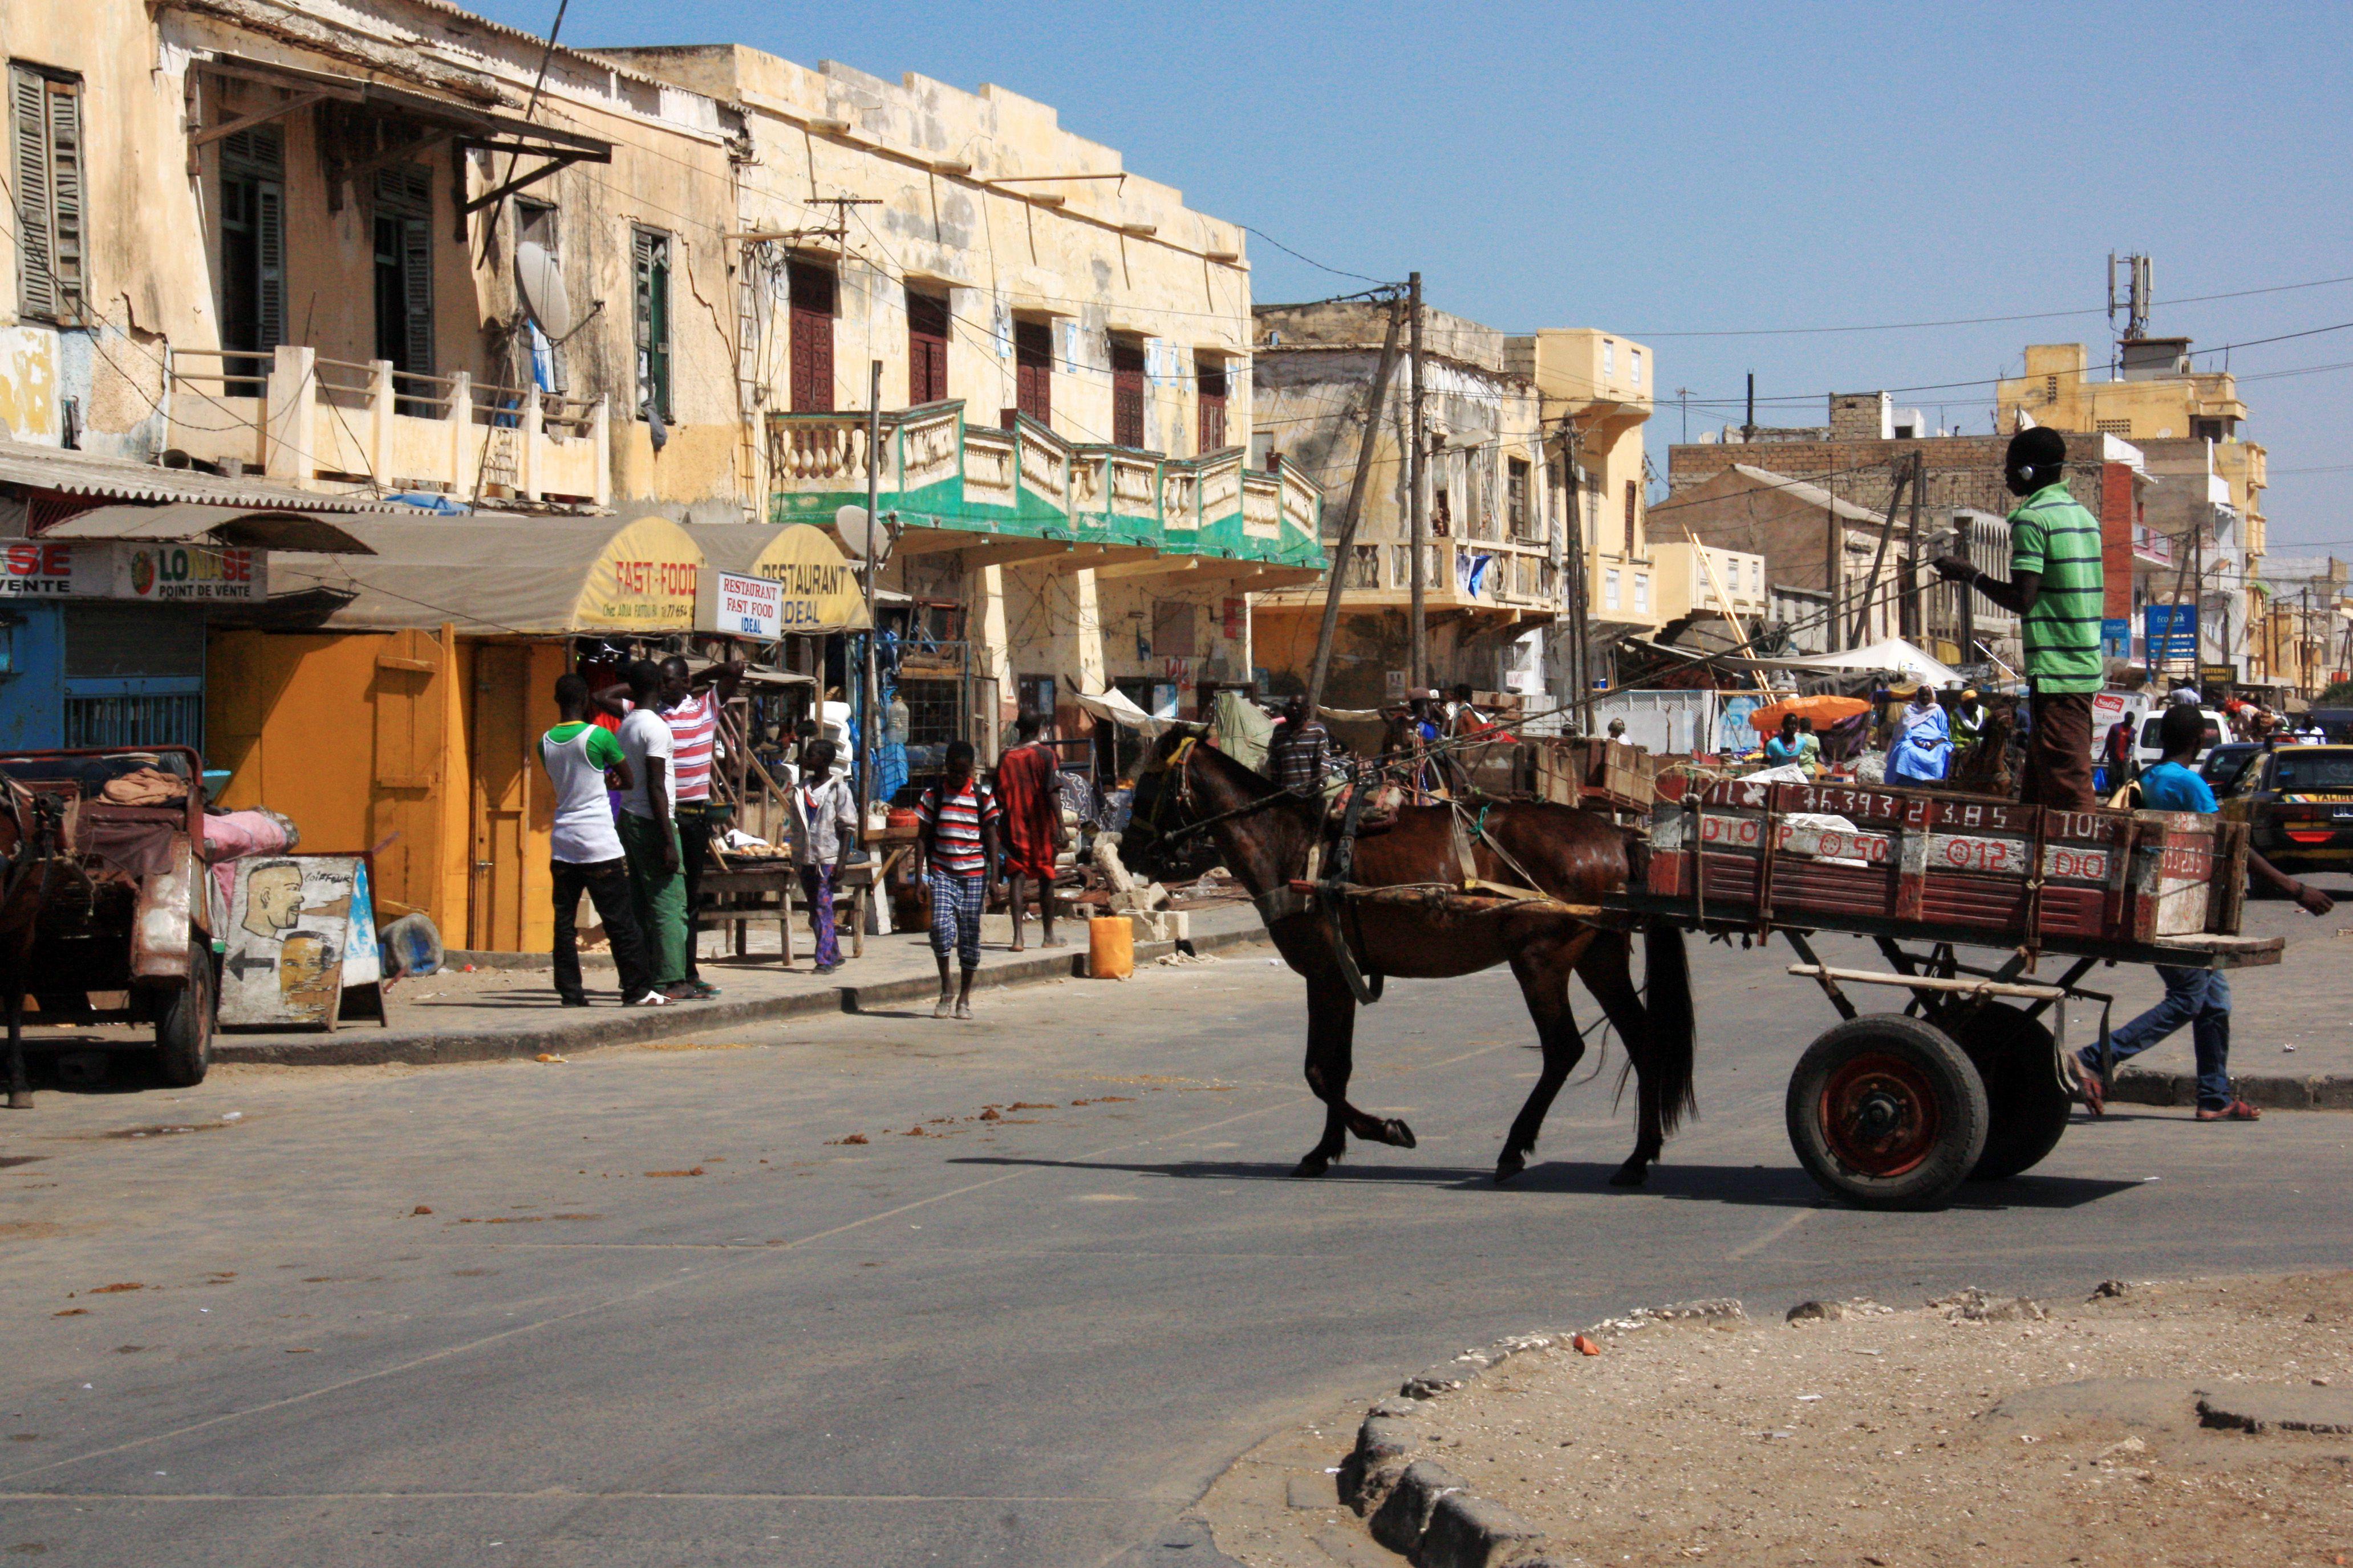 Typical scene on the street in Saint-Louis-du-Sénégal